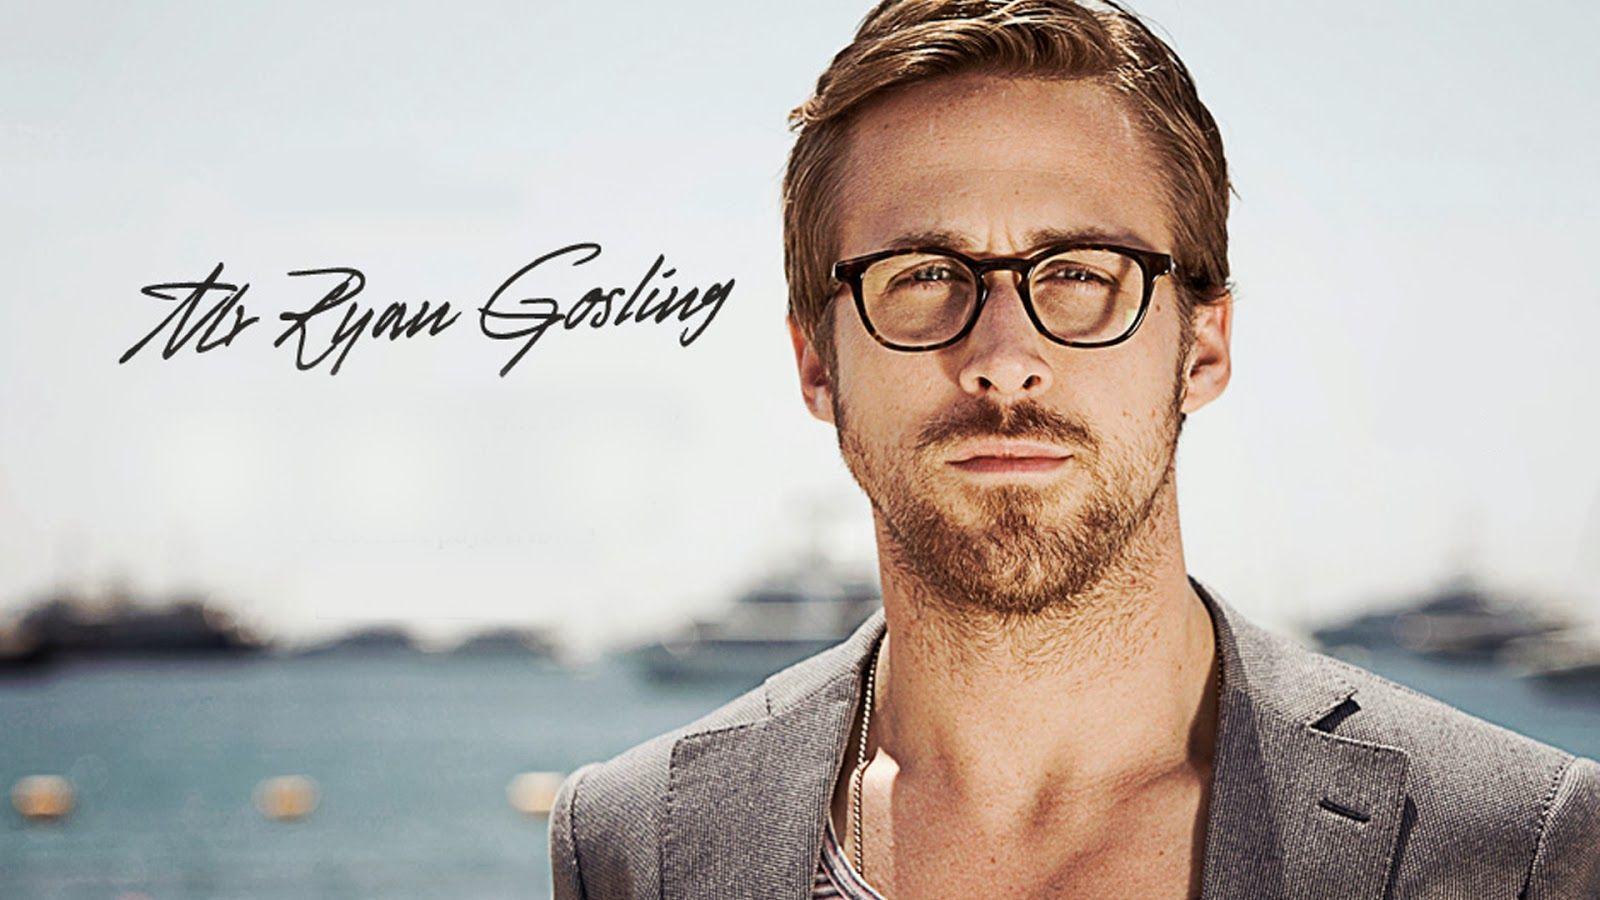 Ryan Gosling Wallpapers 1600x900